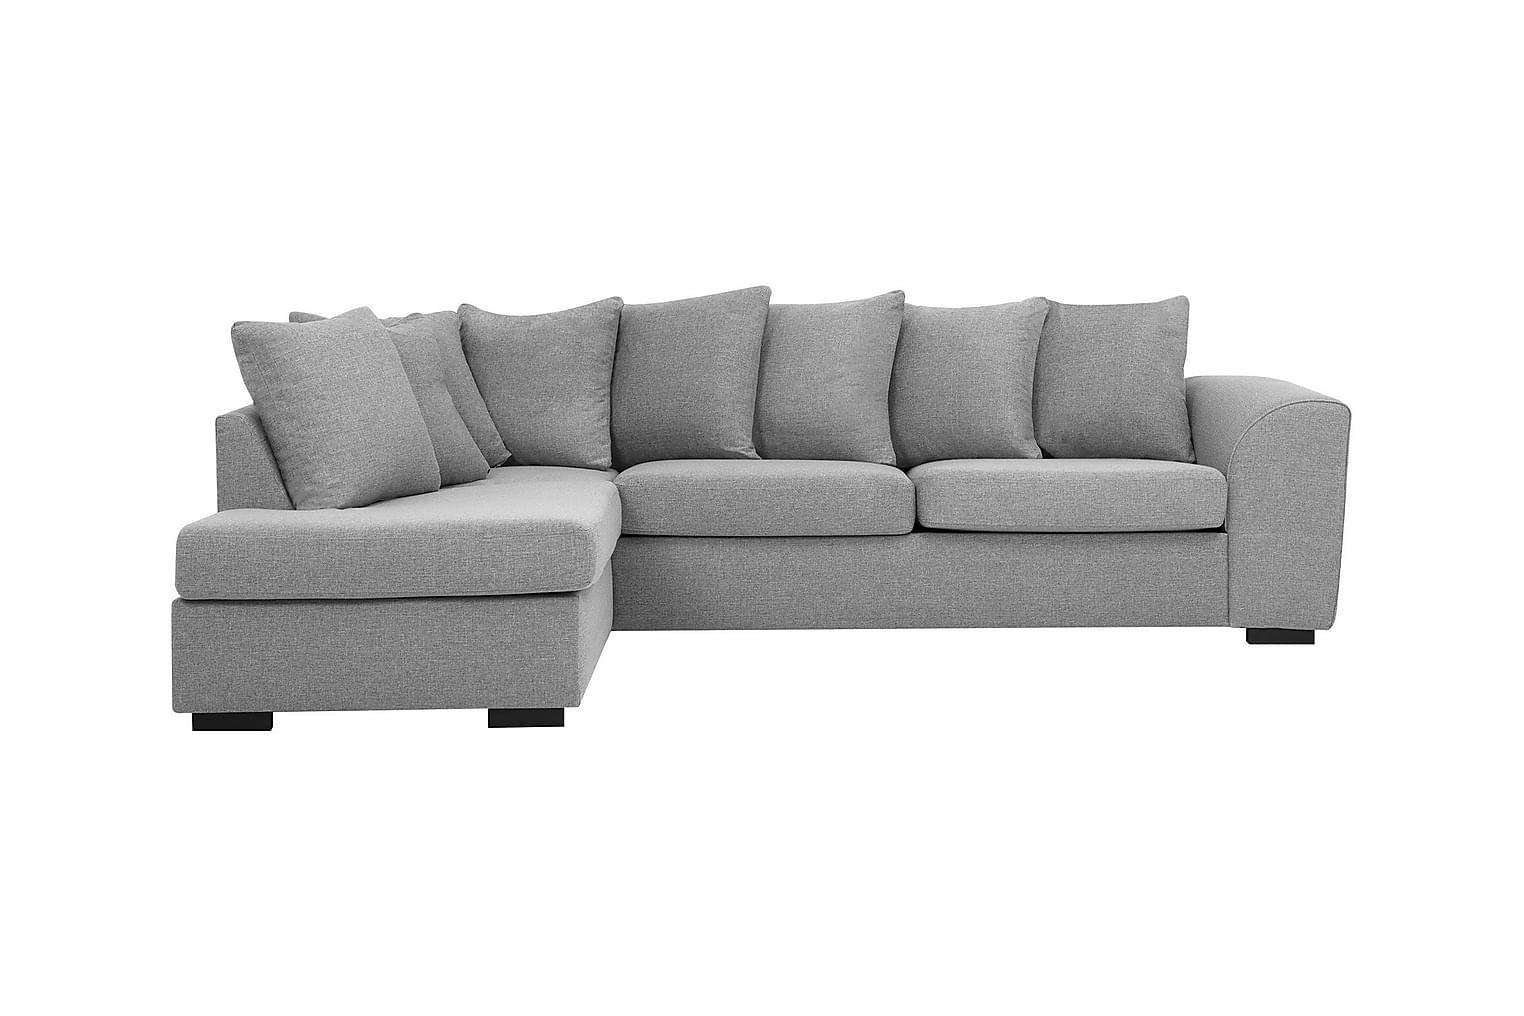 Sofa gr priss k gir deg laveste pris for Sofa 3 cuerpos casanova austin